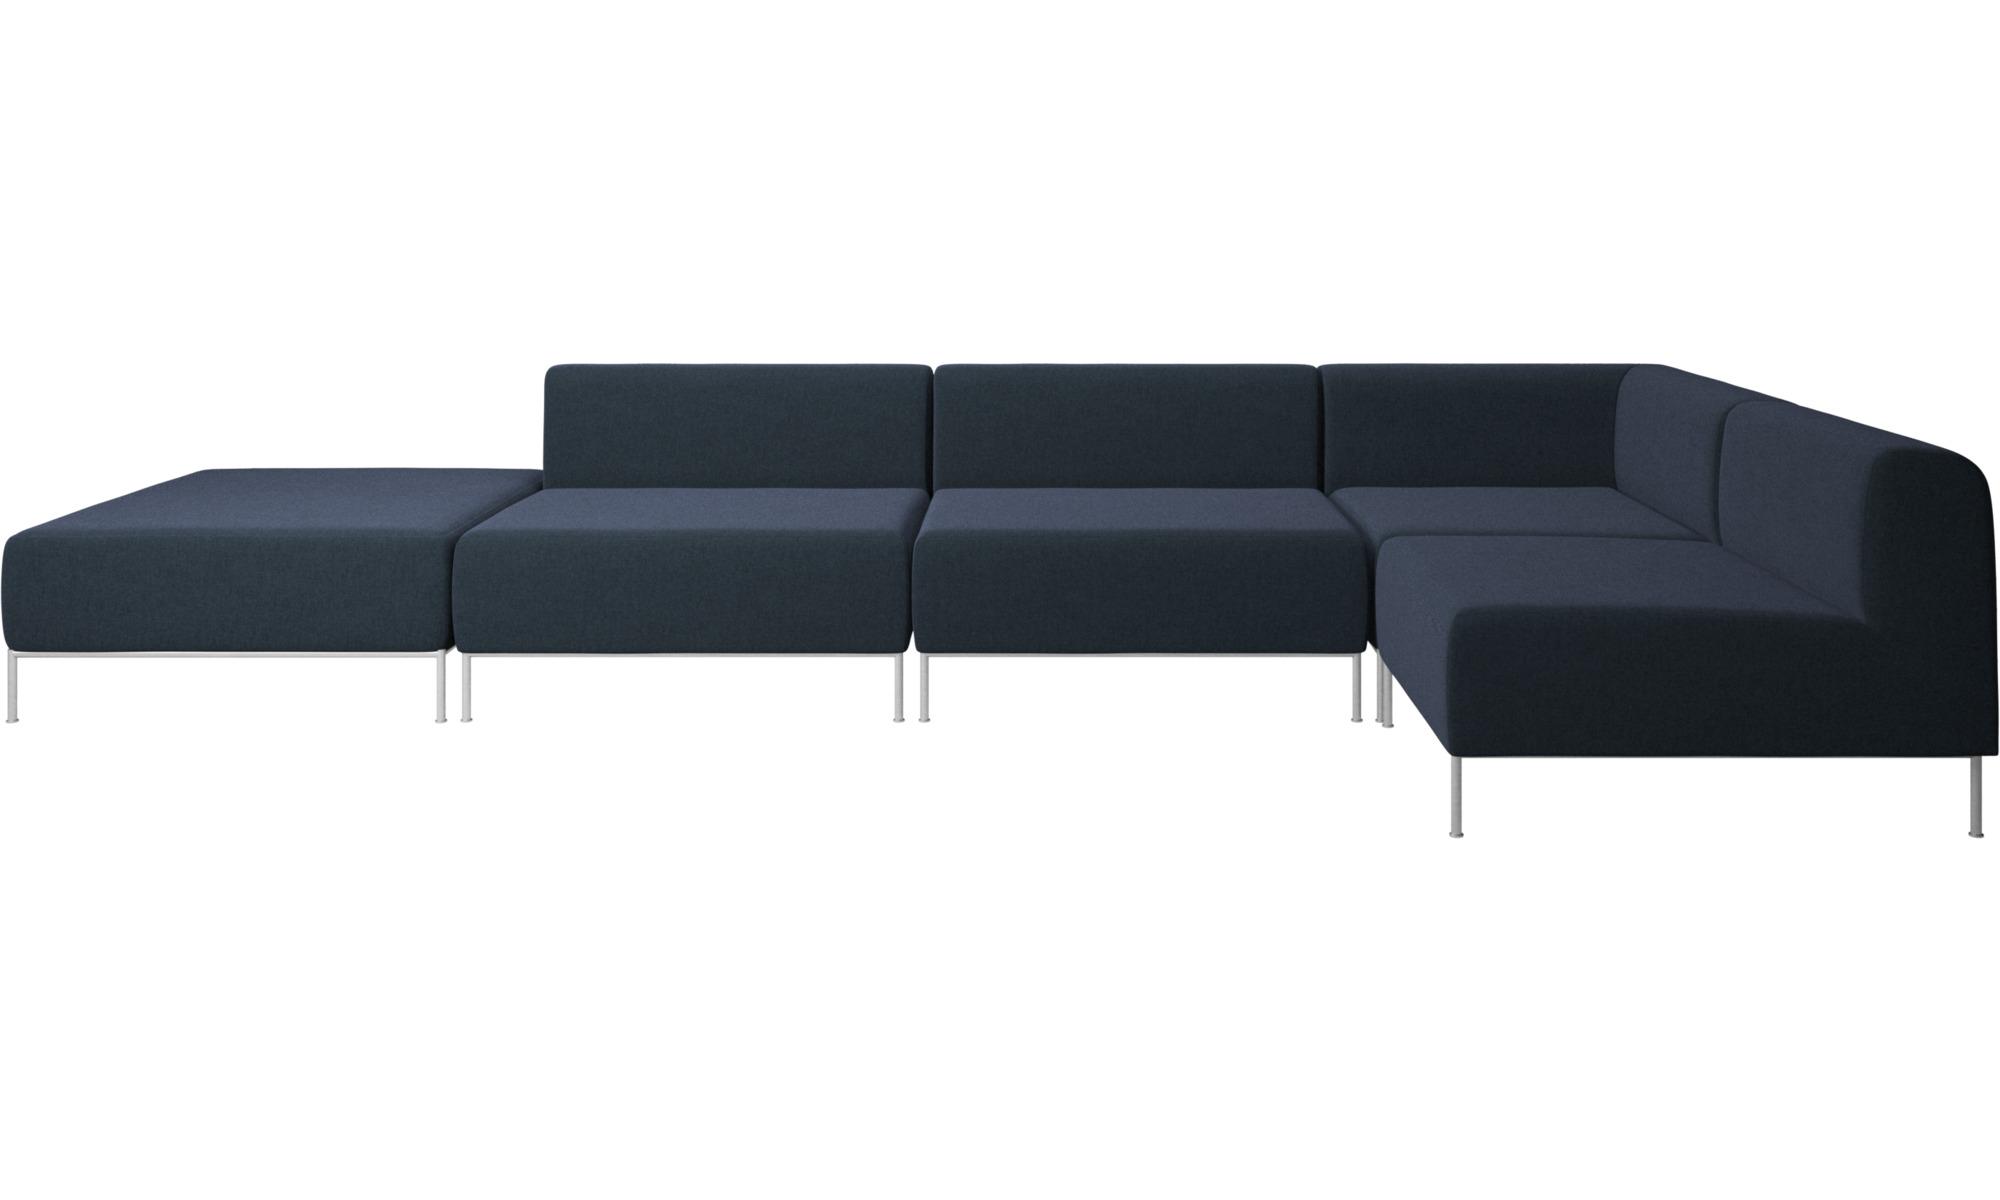 Full Size of Modulares Sofa Mit Schlaffunktion Lennon Modular Set Flex Dhel Westwing System Leder Ikea Kissen Federkern Weißes Mega Big Kolonialstil Xxxl Sitzhöhe 55 Cm Sofa Modulares Sofa